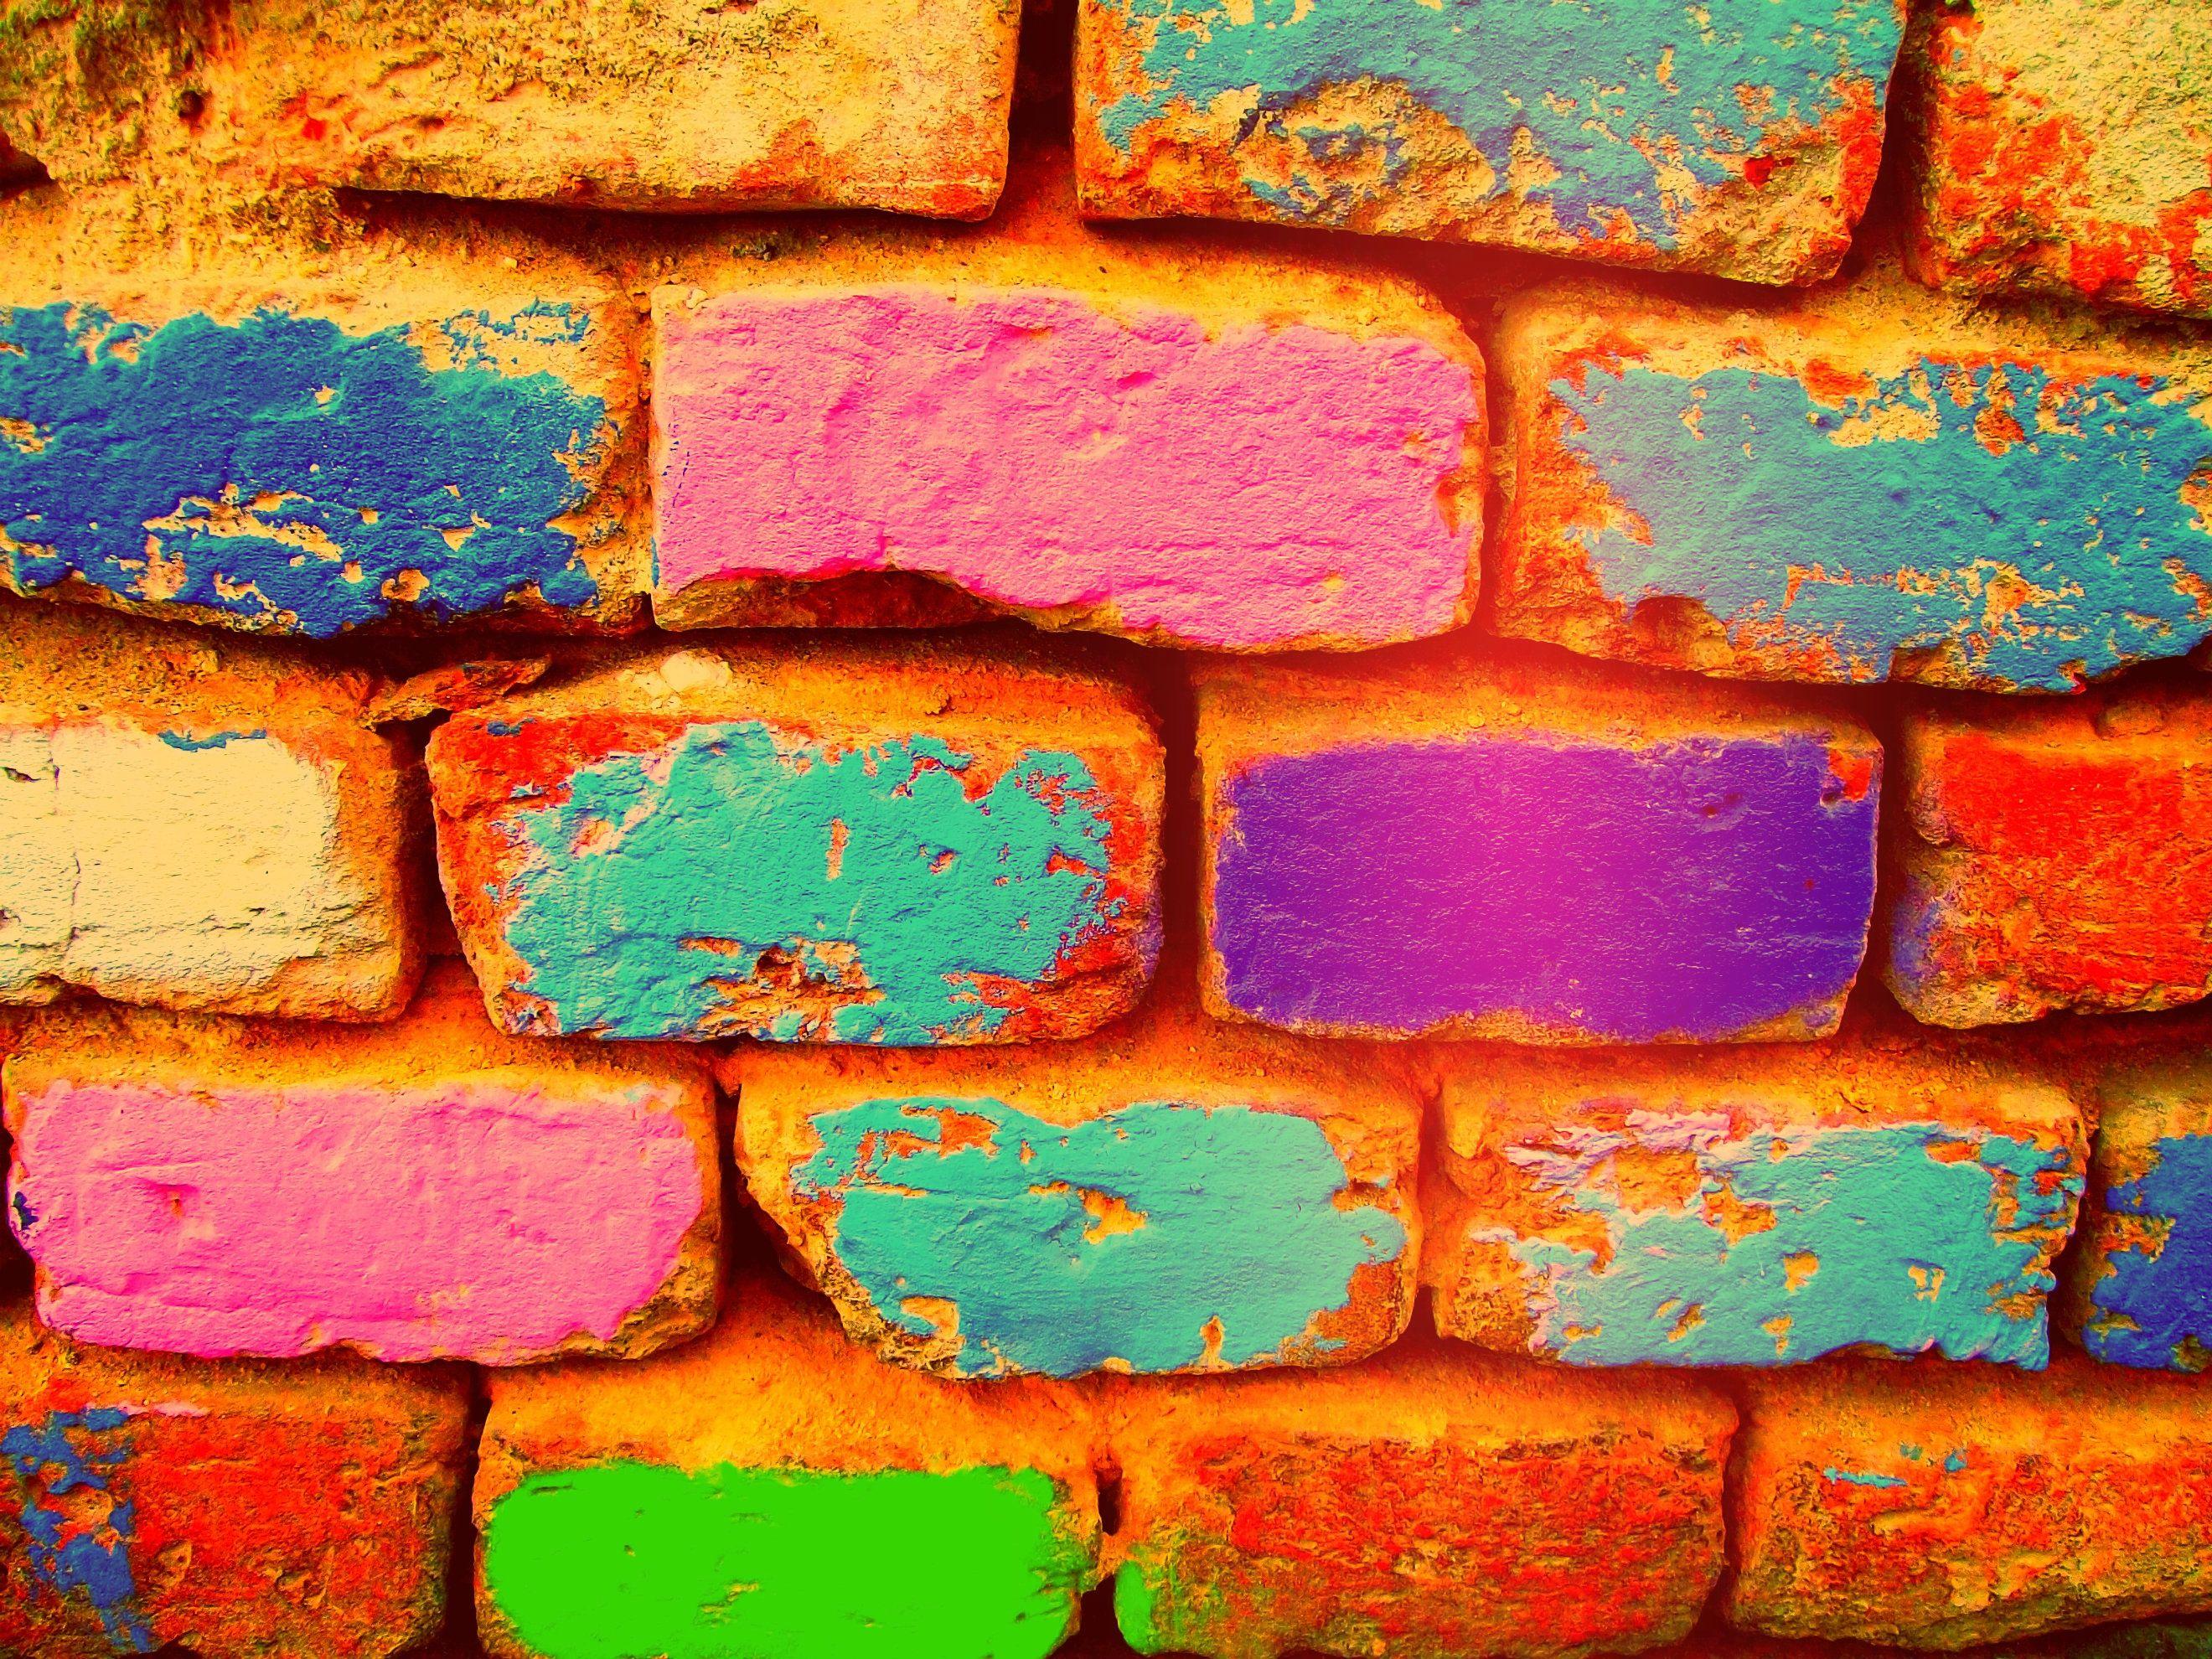 Painted bricks art design Brick art, Painted brick